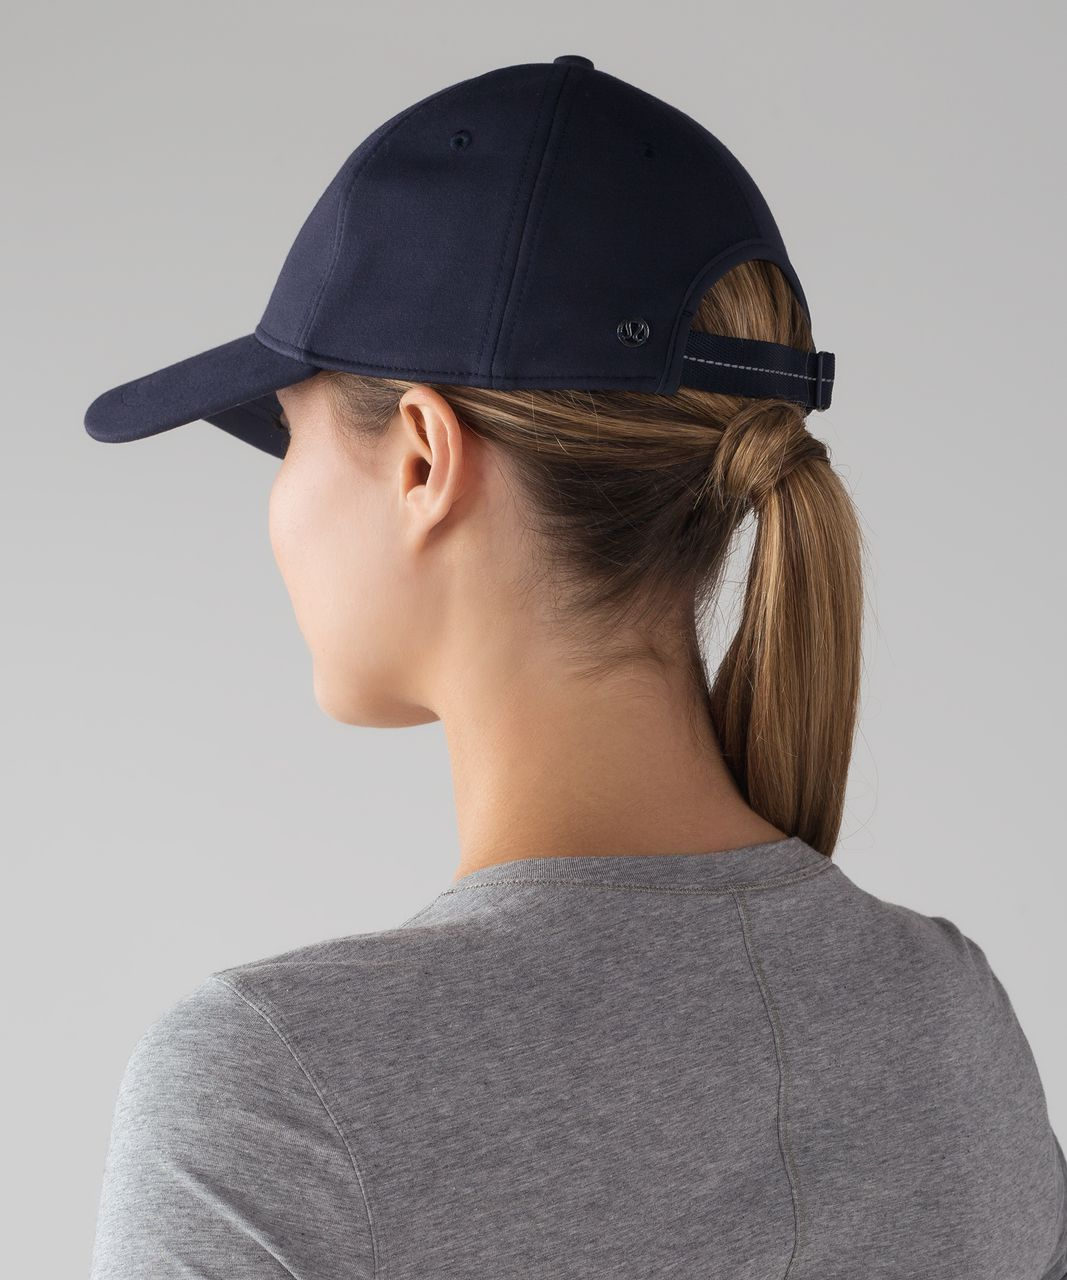 Lululemon Baller Hat - Midnight Navy (First Release)